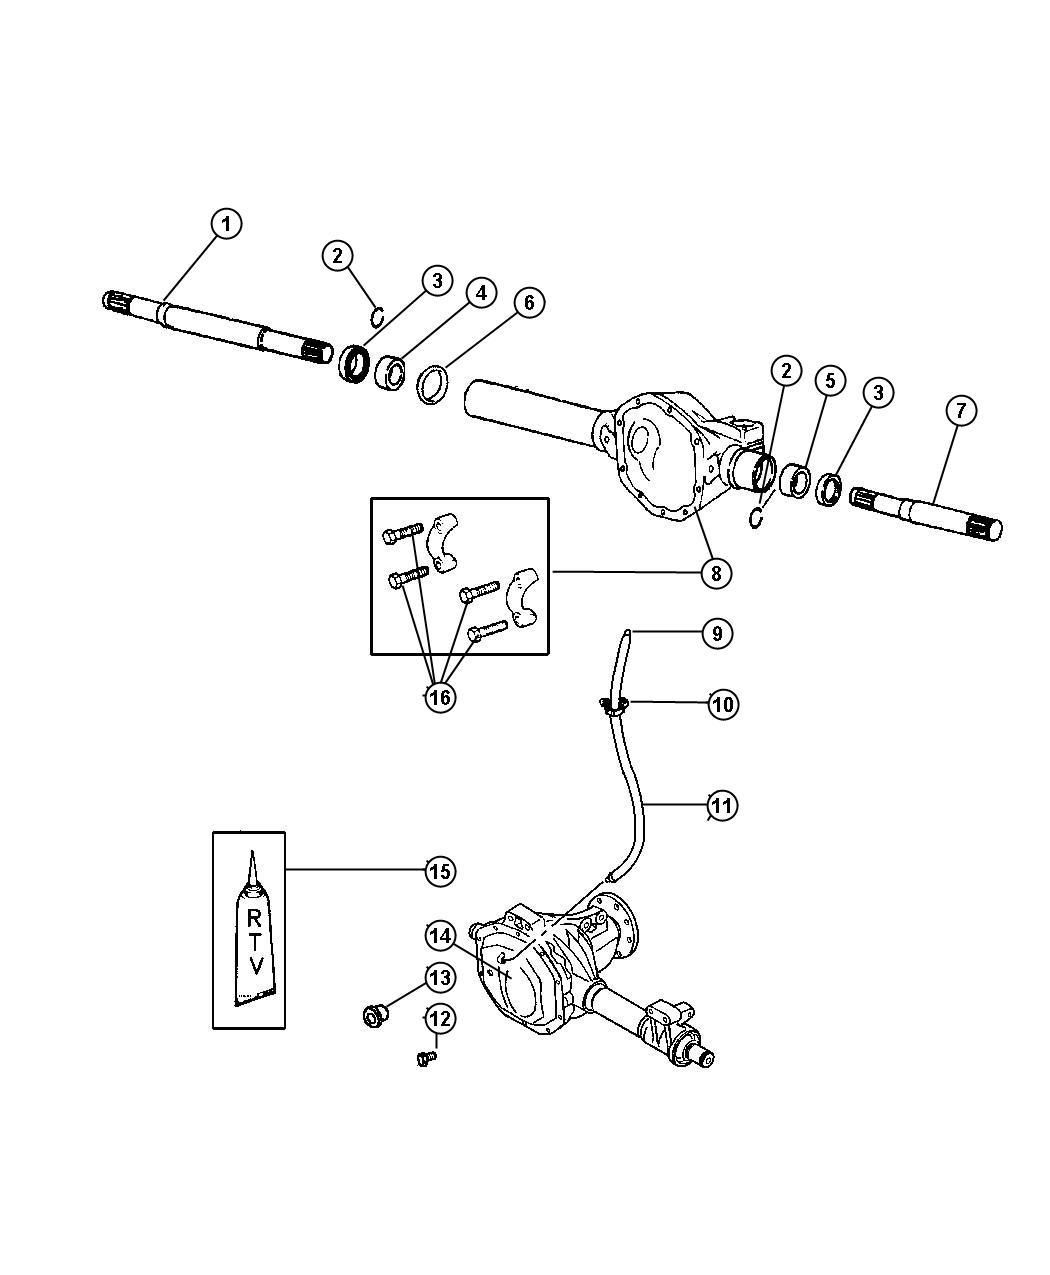 Diagram 86 Dodge 1500 Front End 4x4, Diagram, Free Engine